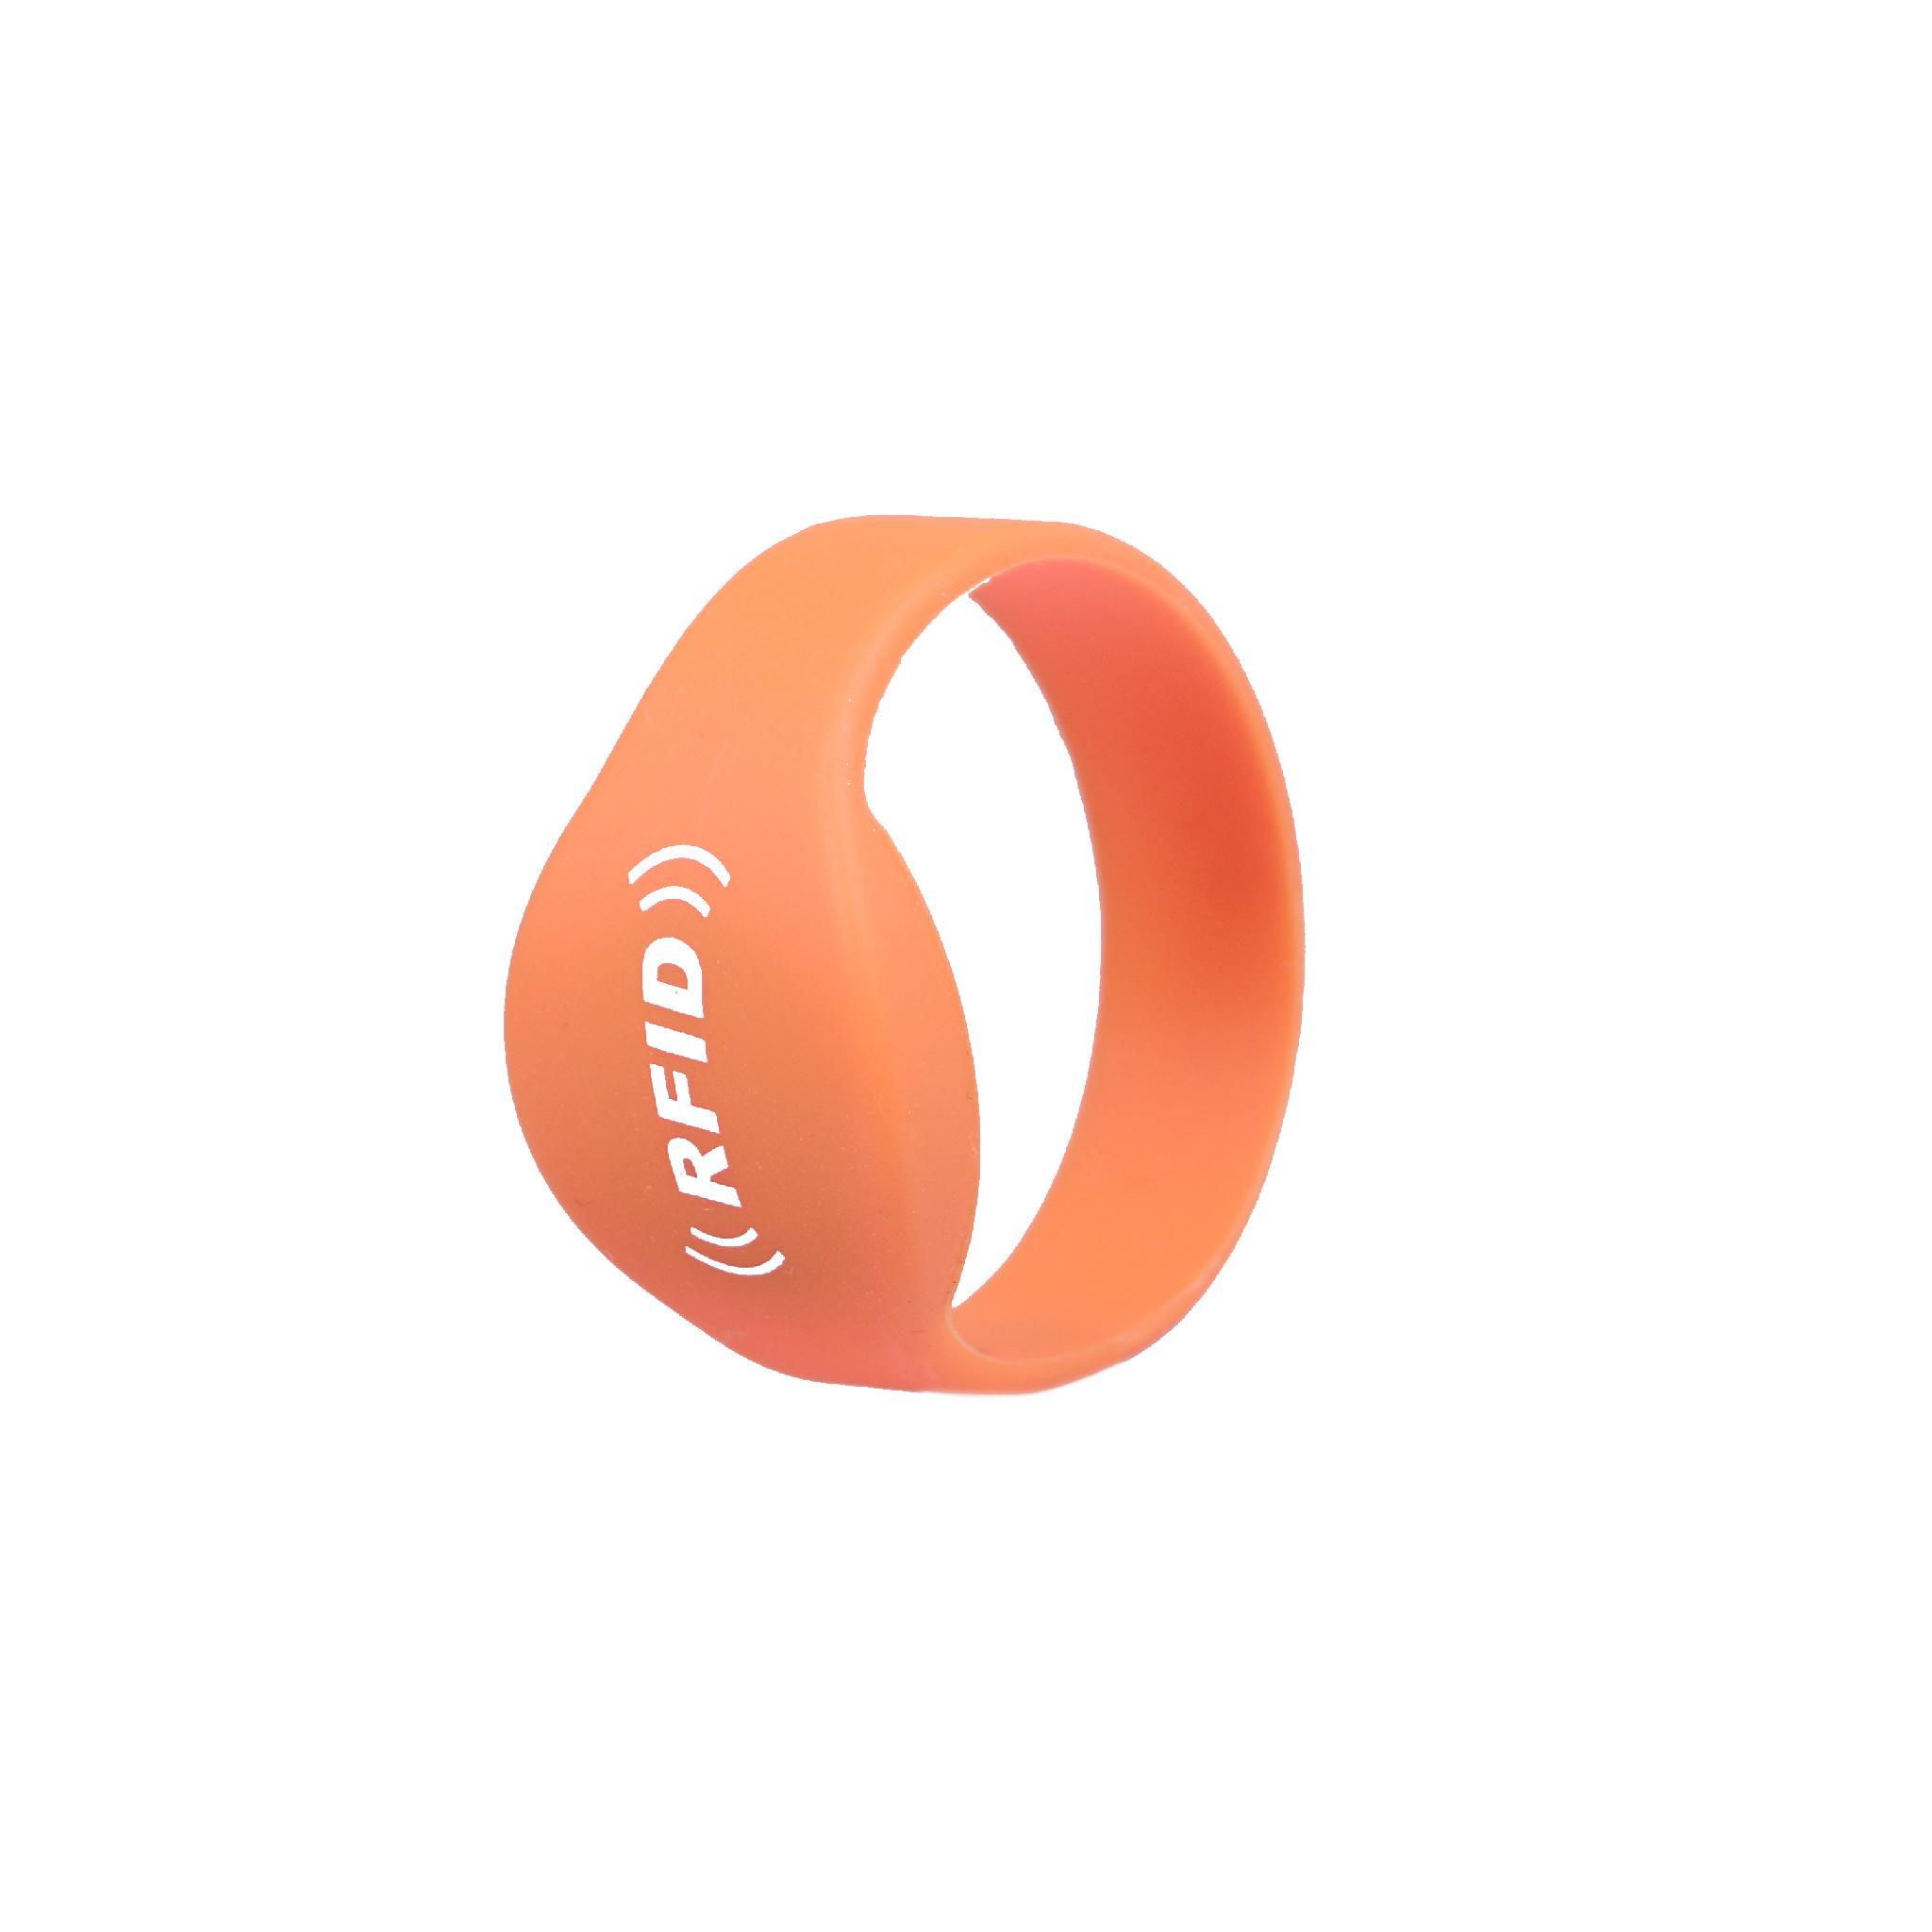 13.56Mhz HF RFID Silicon Wristband Tag 1